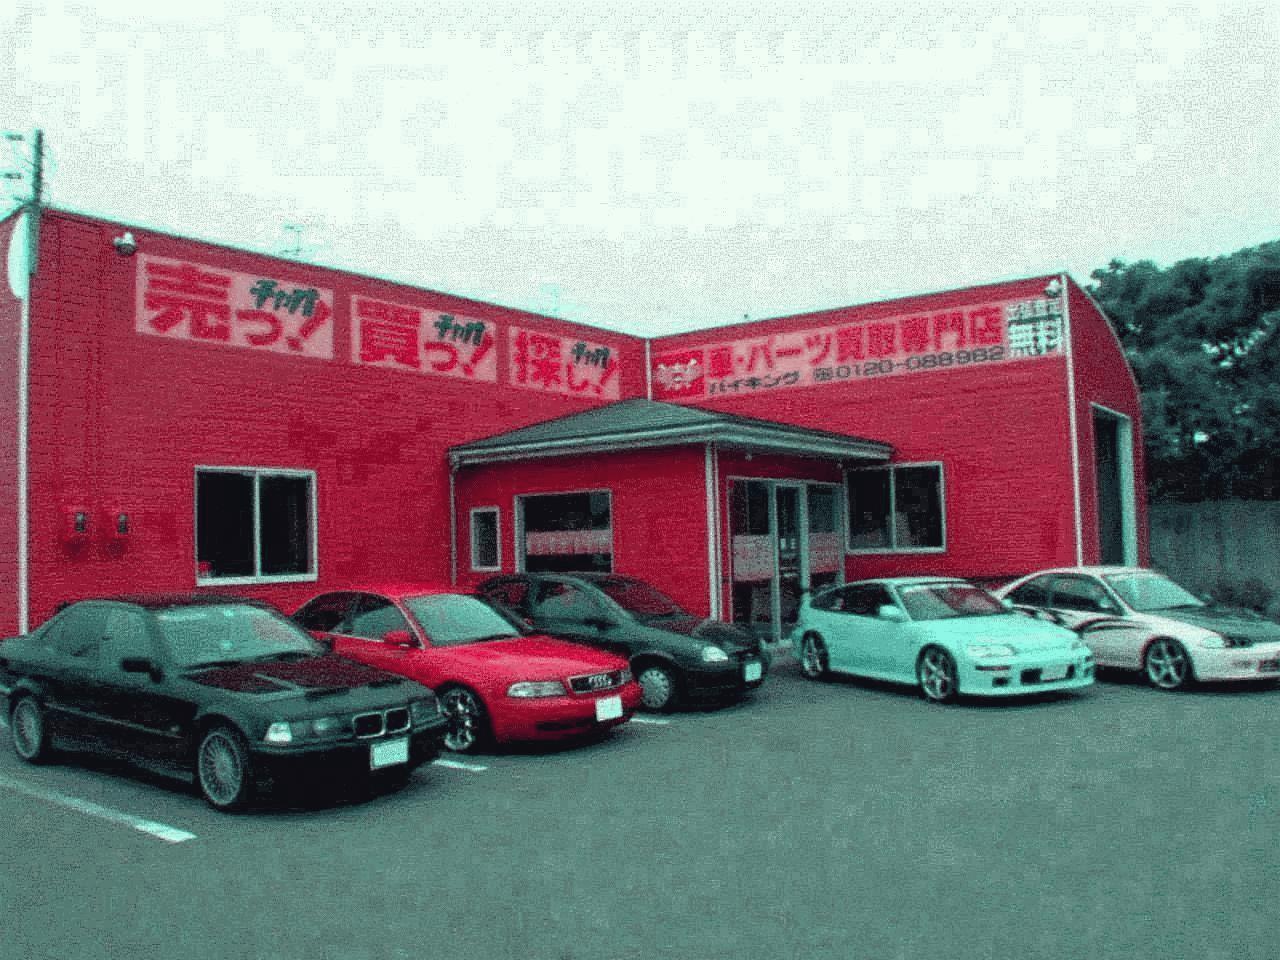 AUTO MOBILE (有)オートモービル 車&パーツ買取専門店バイキング